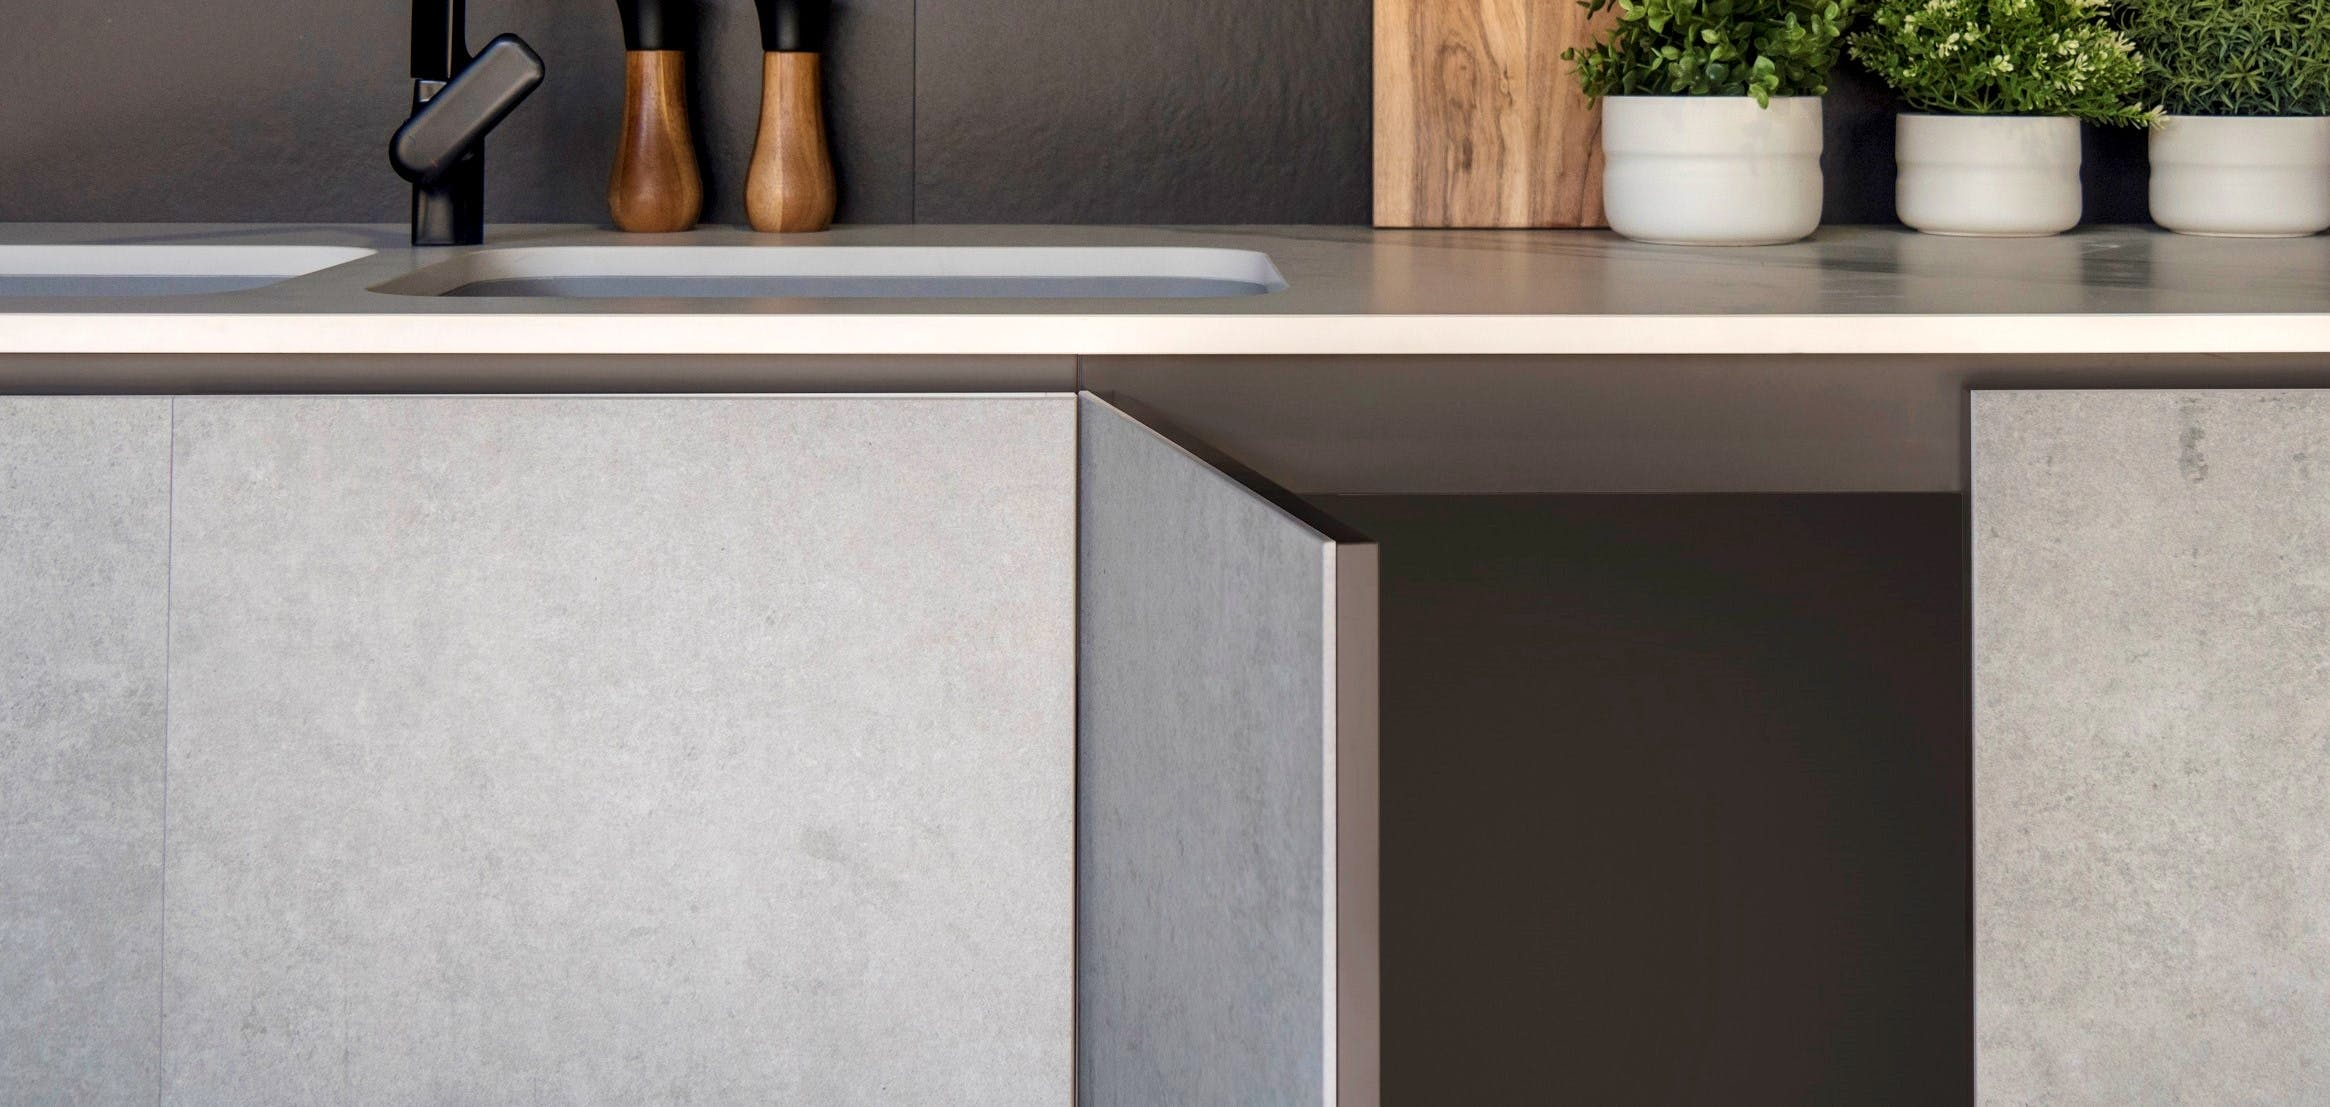 Image of Dekton Slim 4mm Kreta cabinetry cladding Dekton Slim 4mm Sirius splashback 2 in Dekton Slim Wins at the Designer Kitchen and Bathroom Awards 2019 - Cosentino